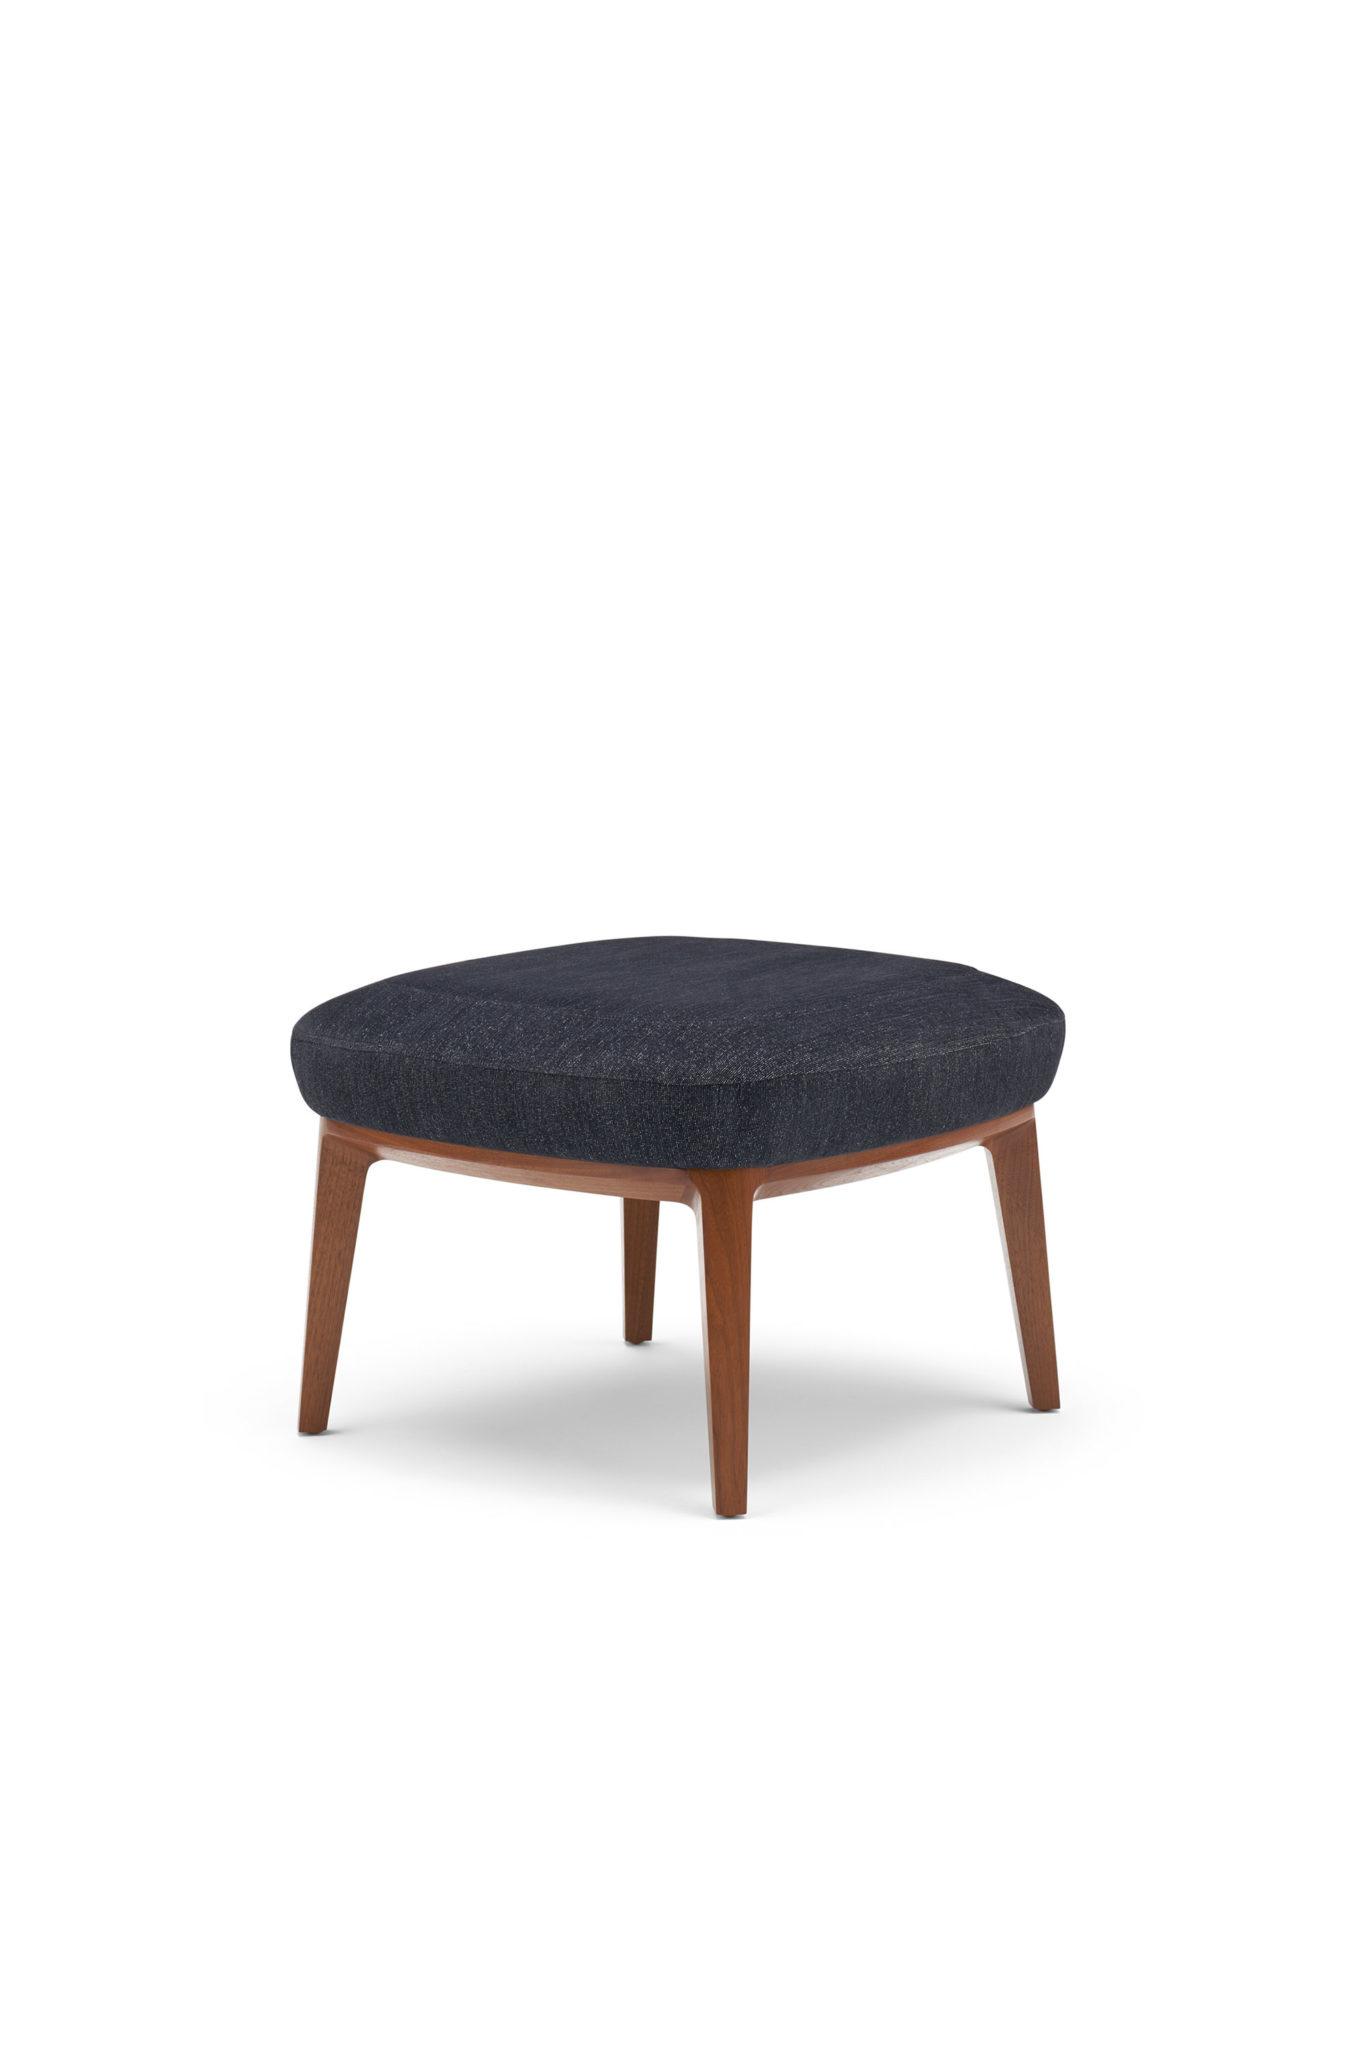 clover wood low stool cumberland furniture